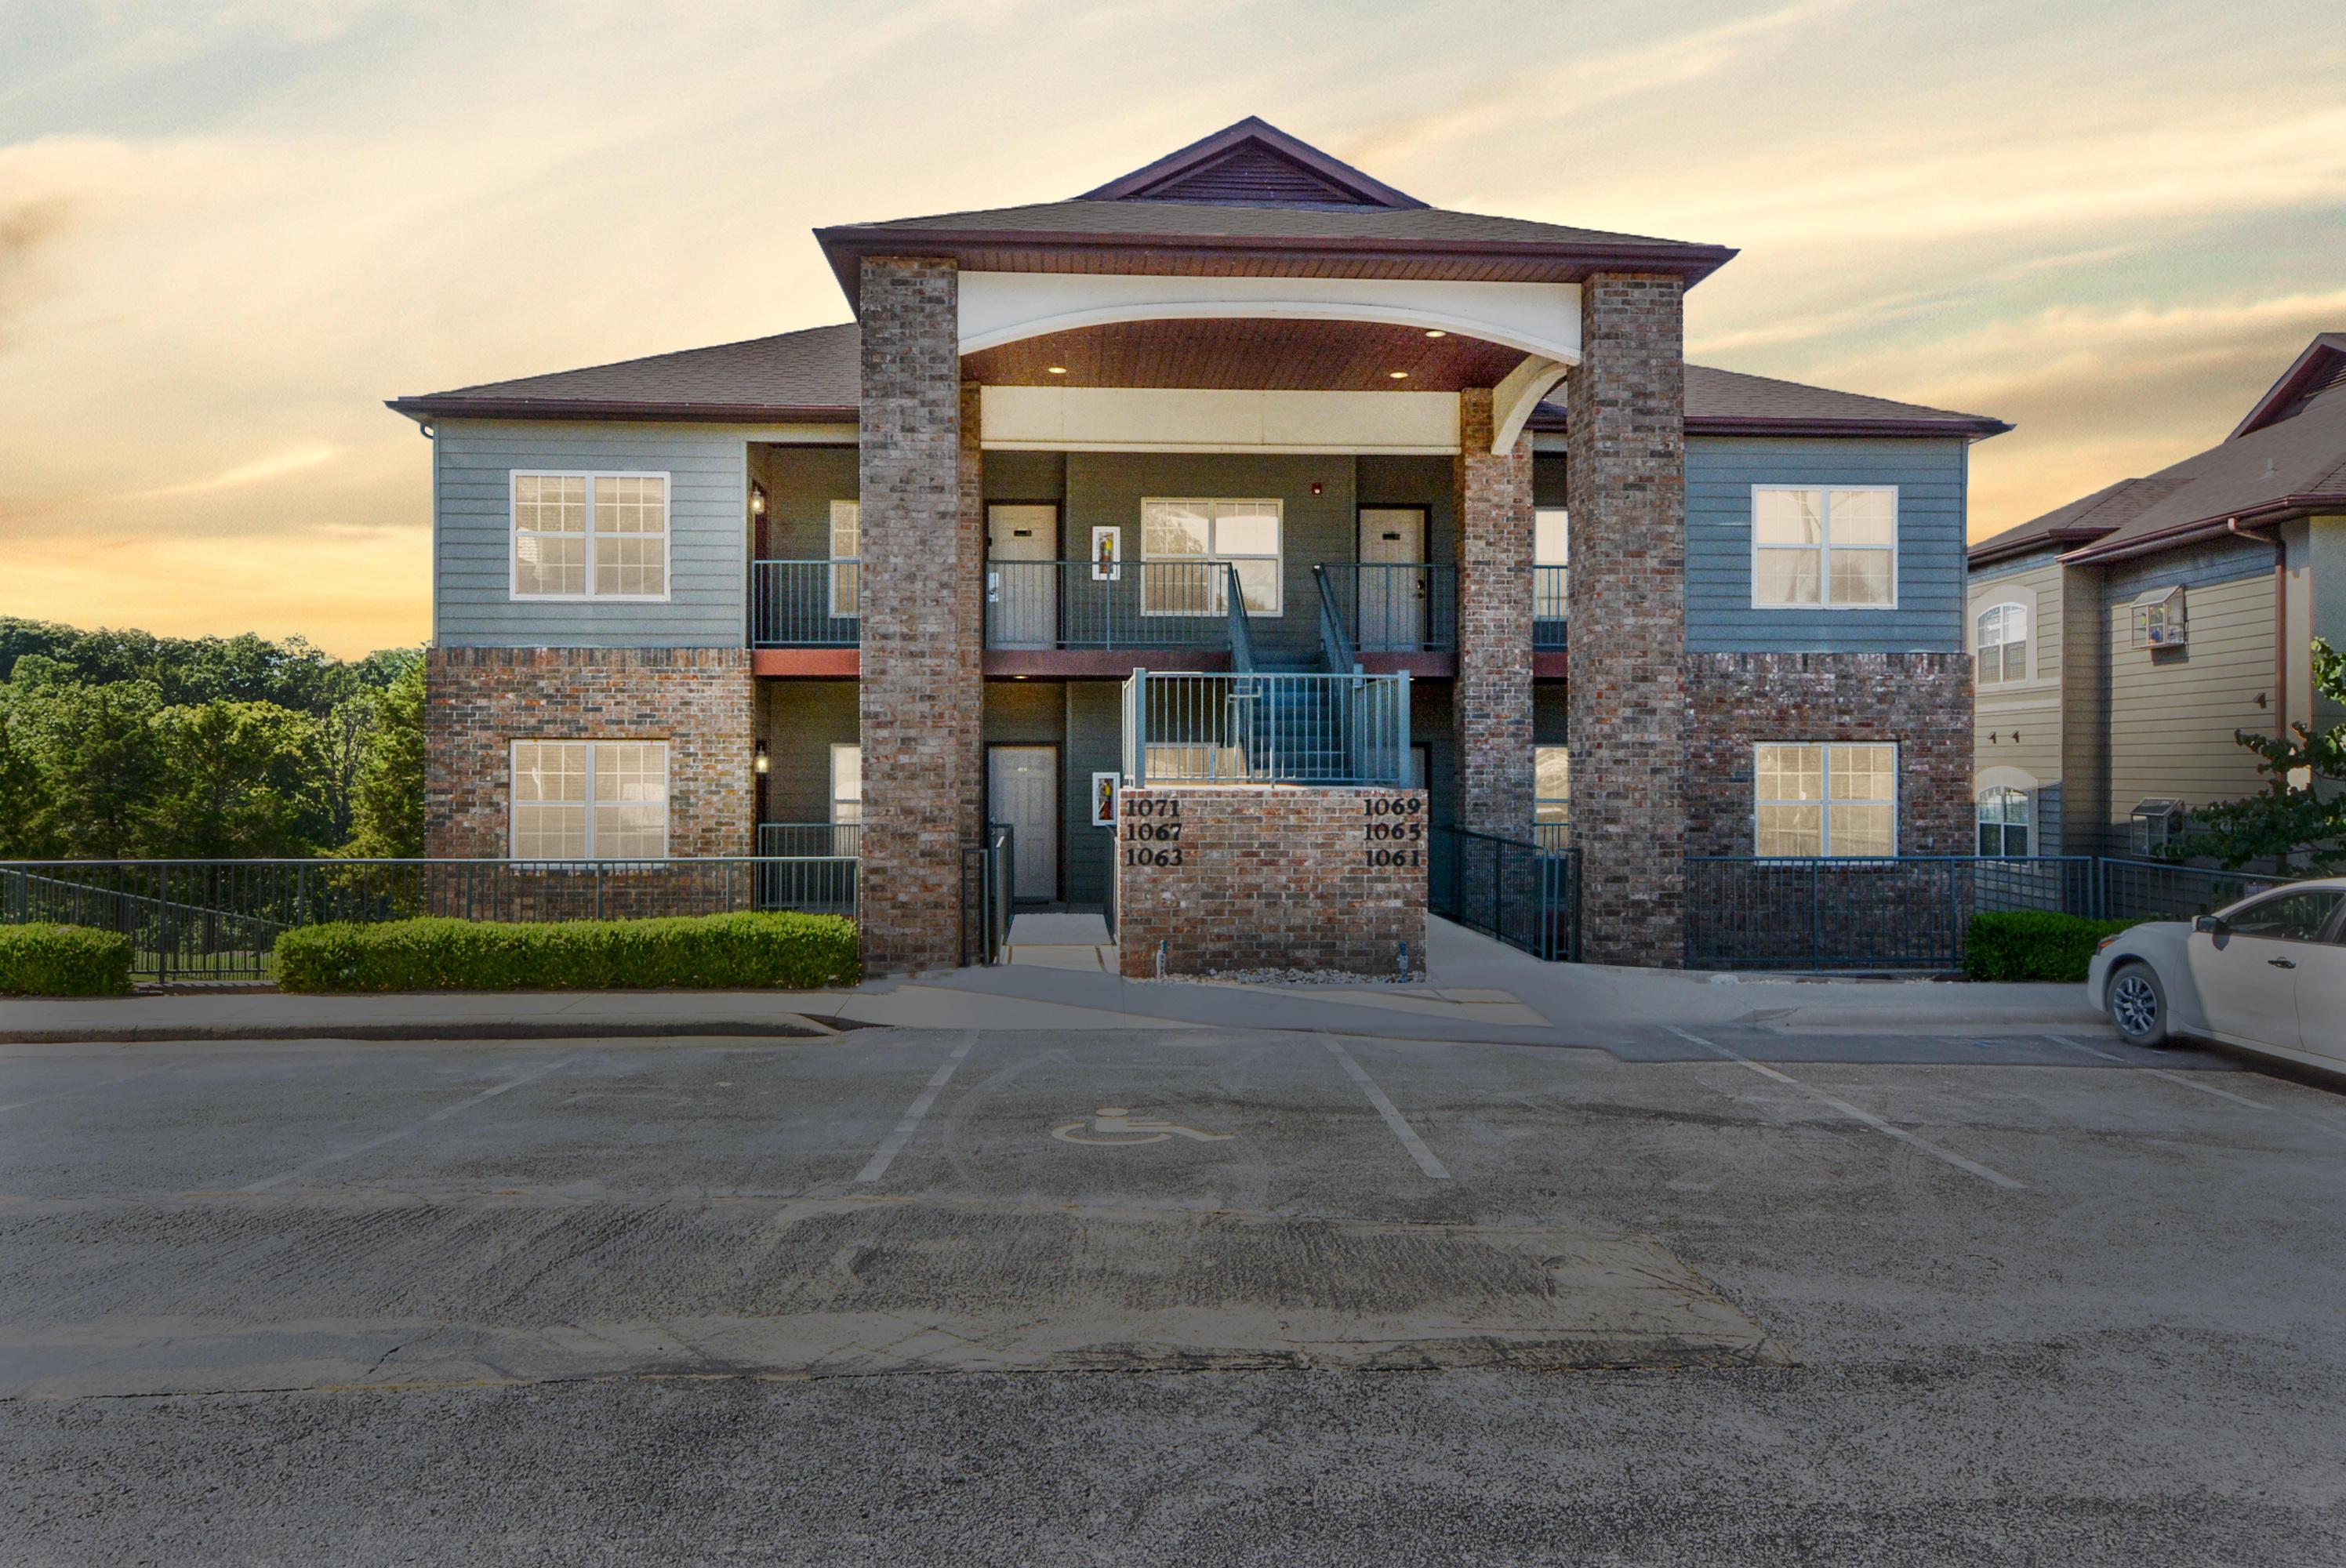 1063 Golf Drive #1 Branson West, MO 65737